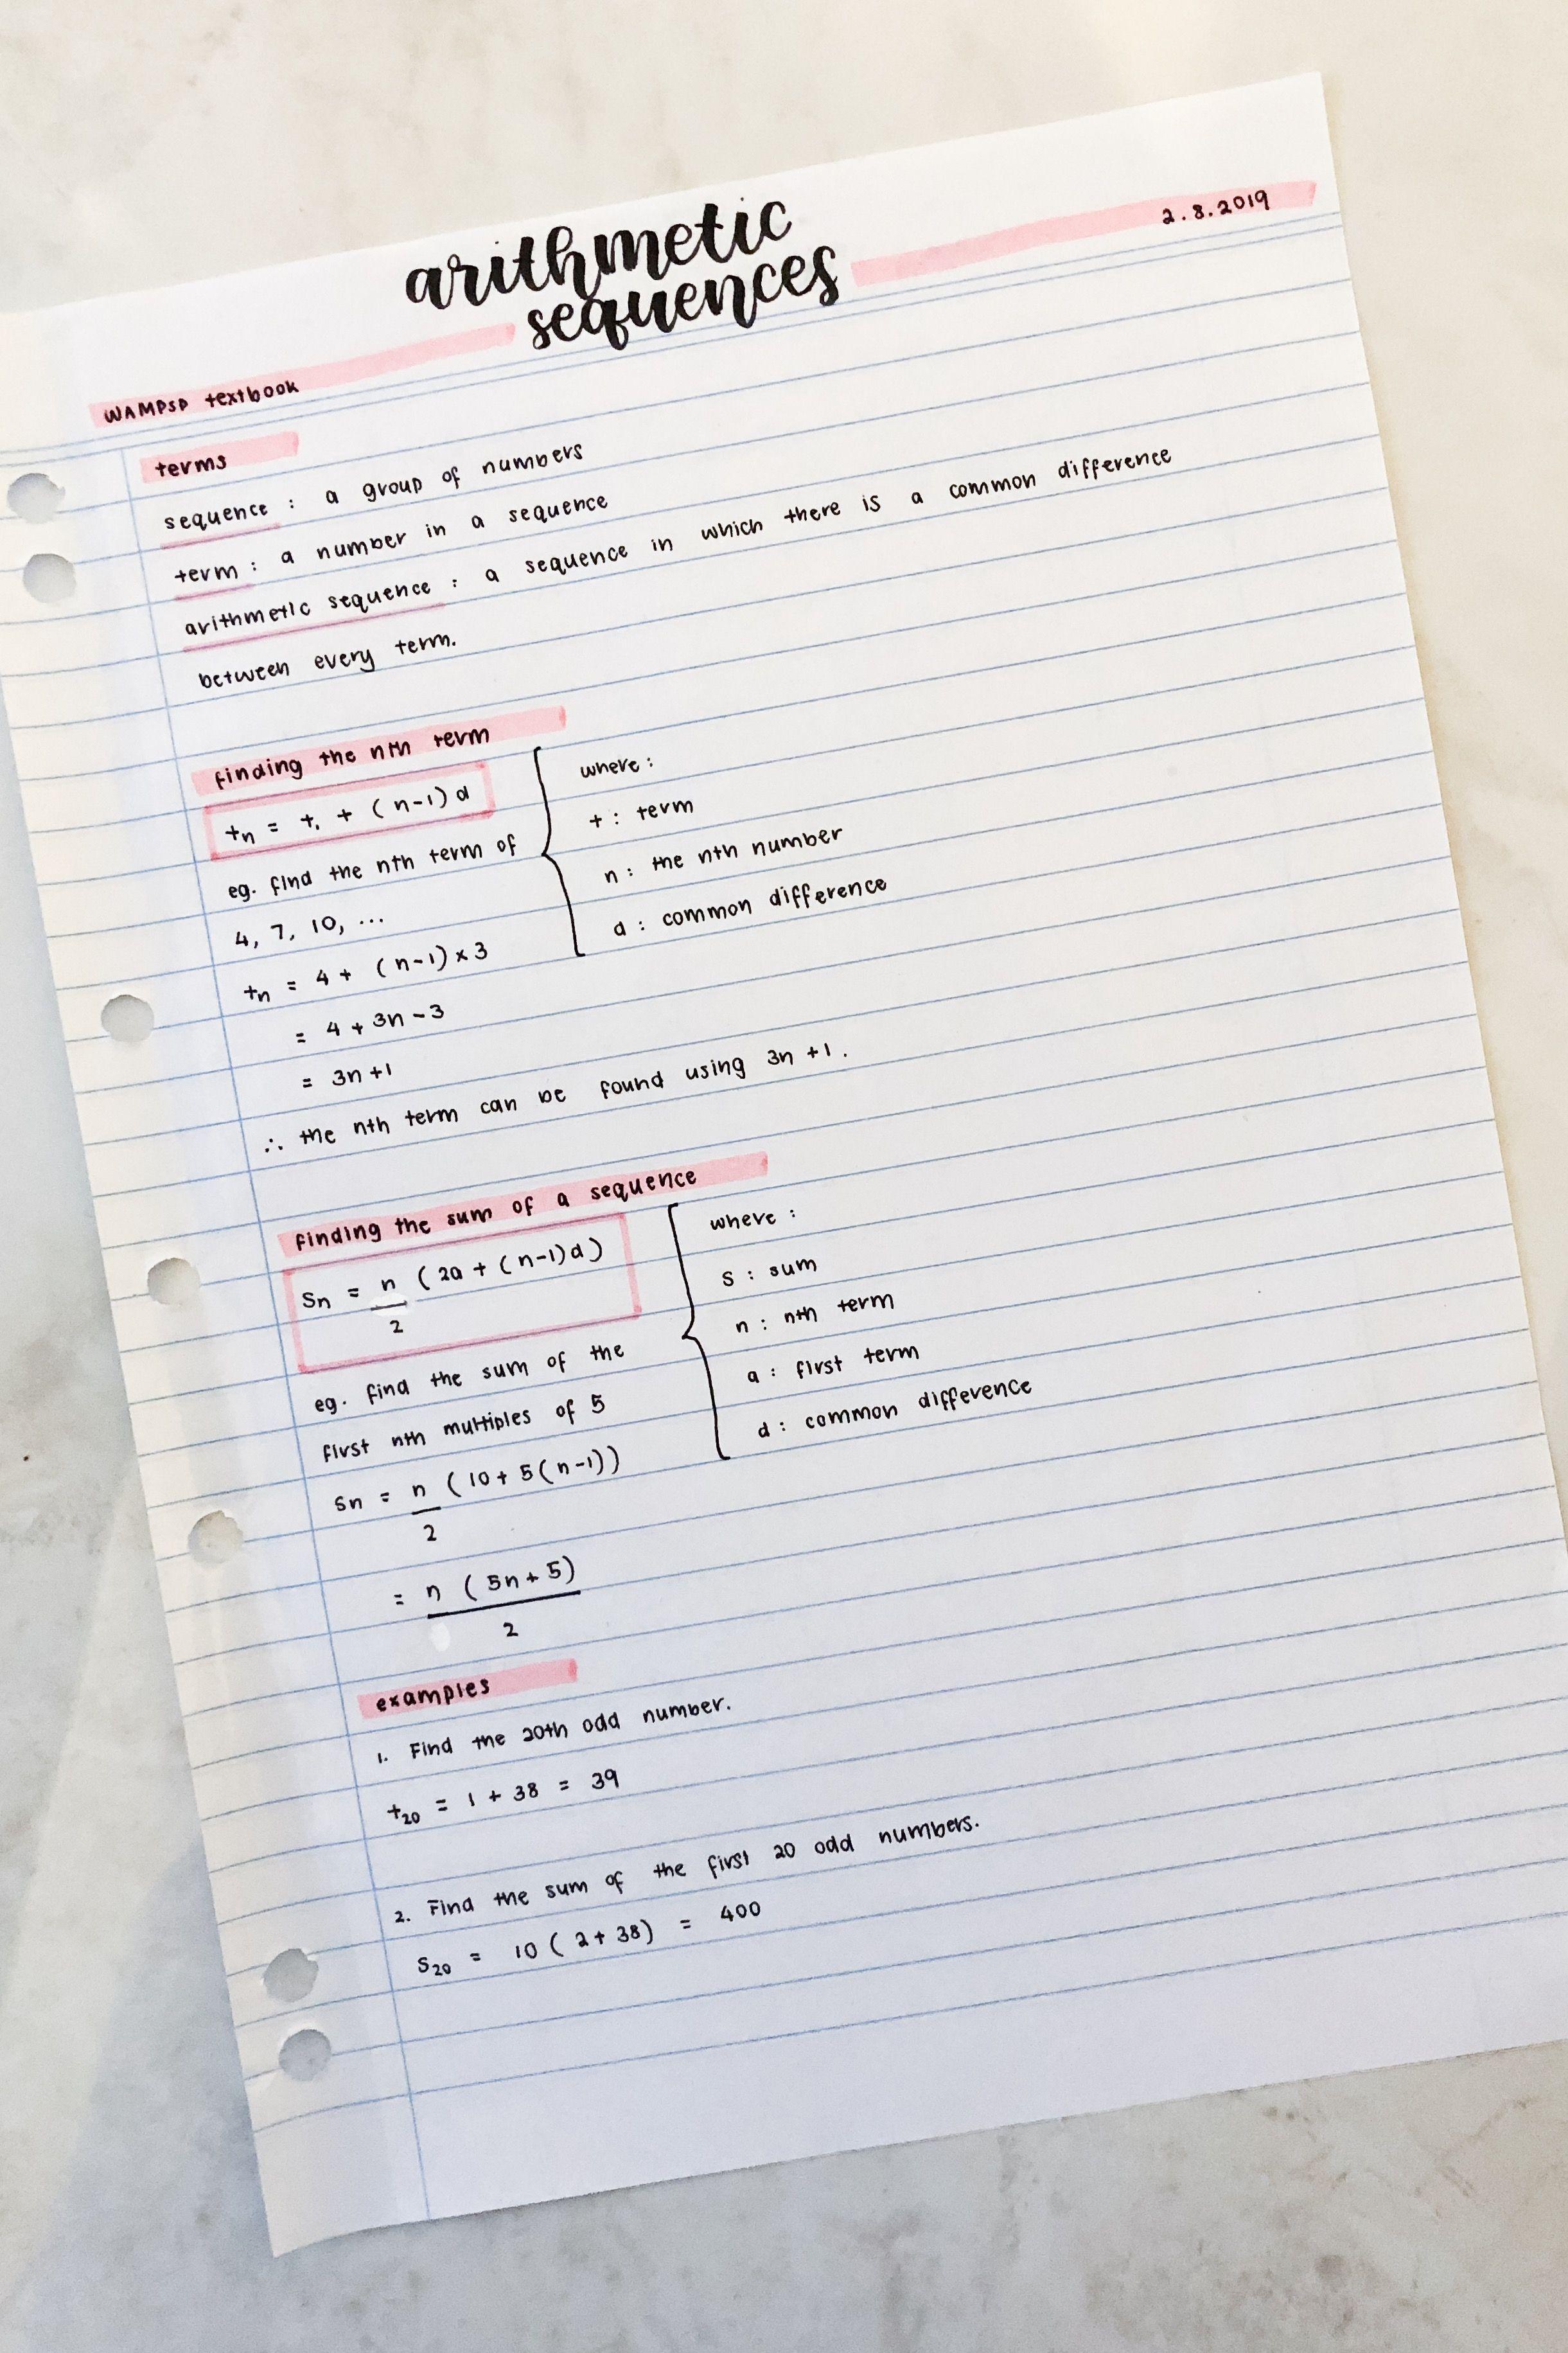 studying arithmetic sequences | oceanstudies